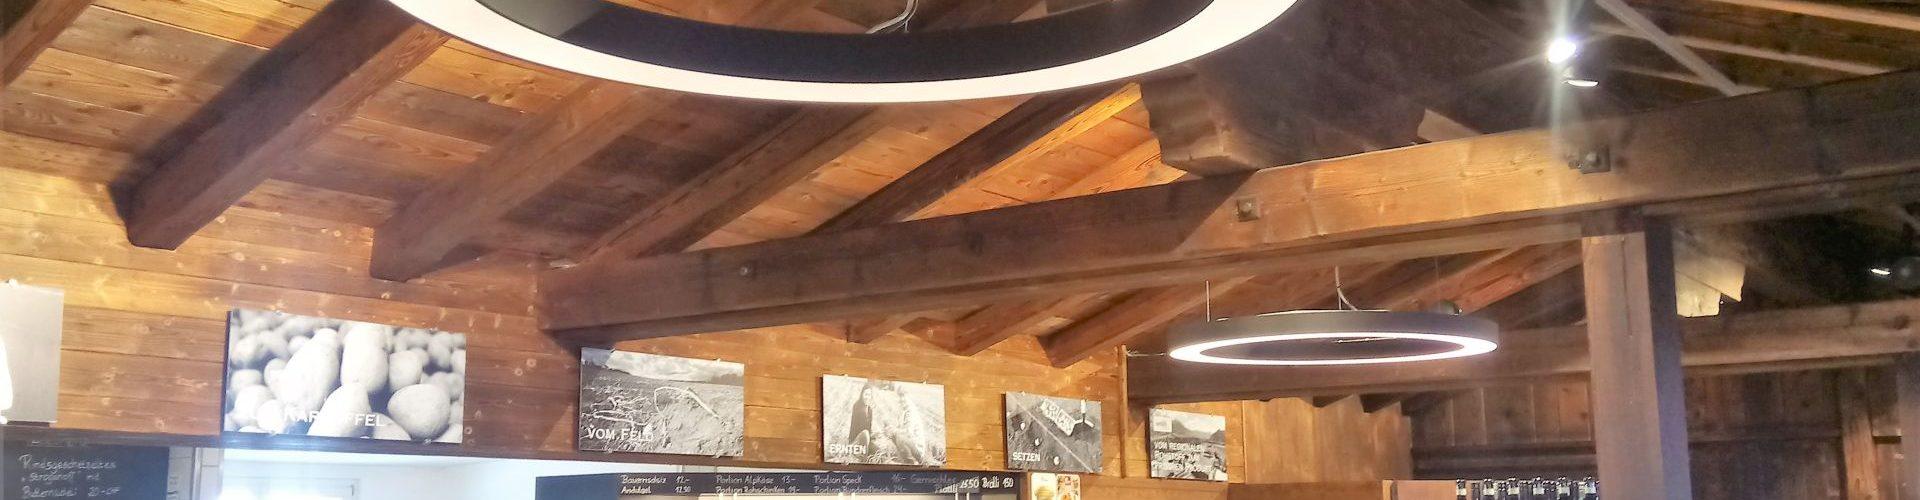 Energieeffizienz Bergrestaurant Curnius